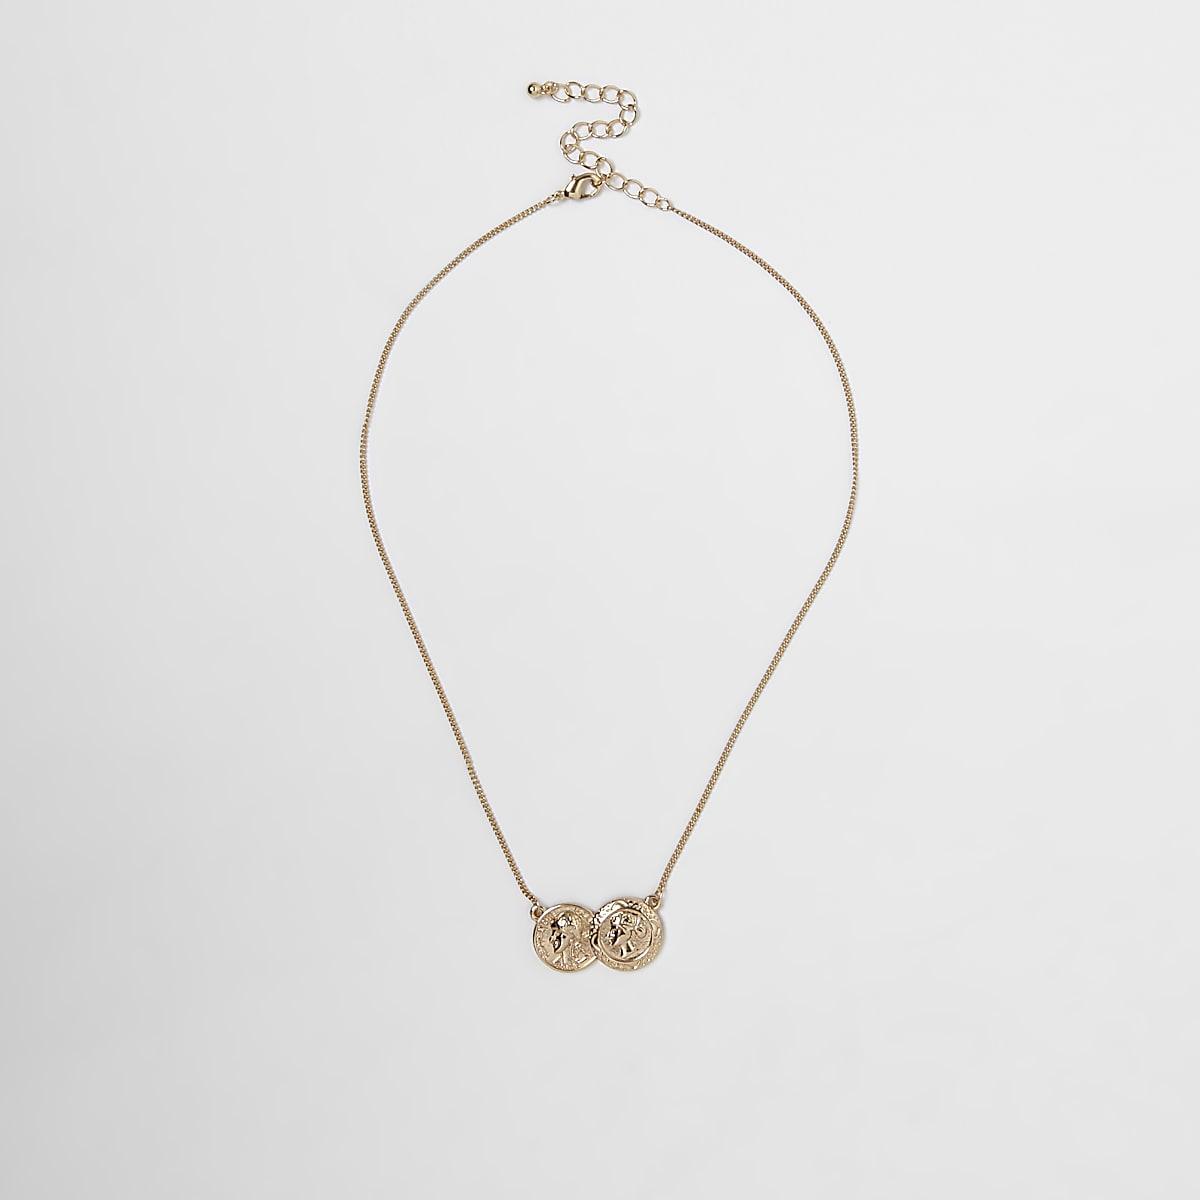 Gold colour double coin necklace